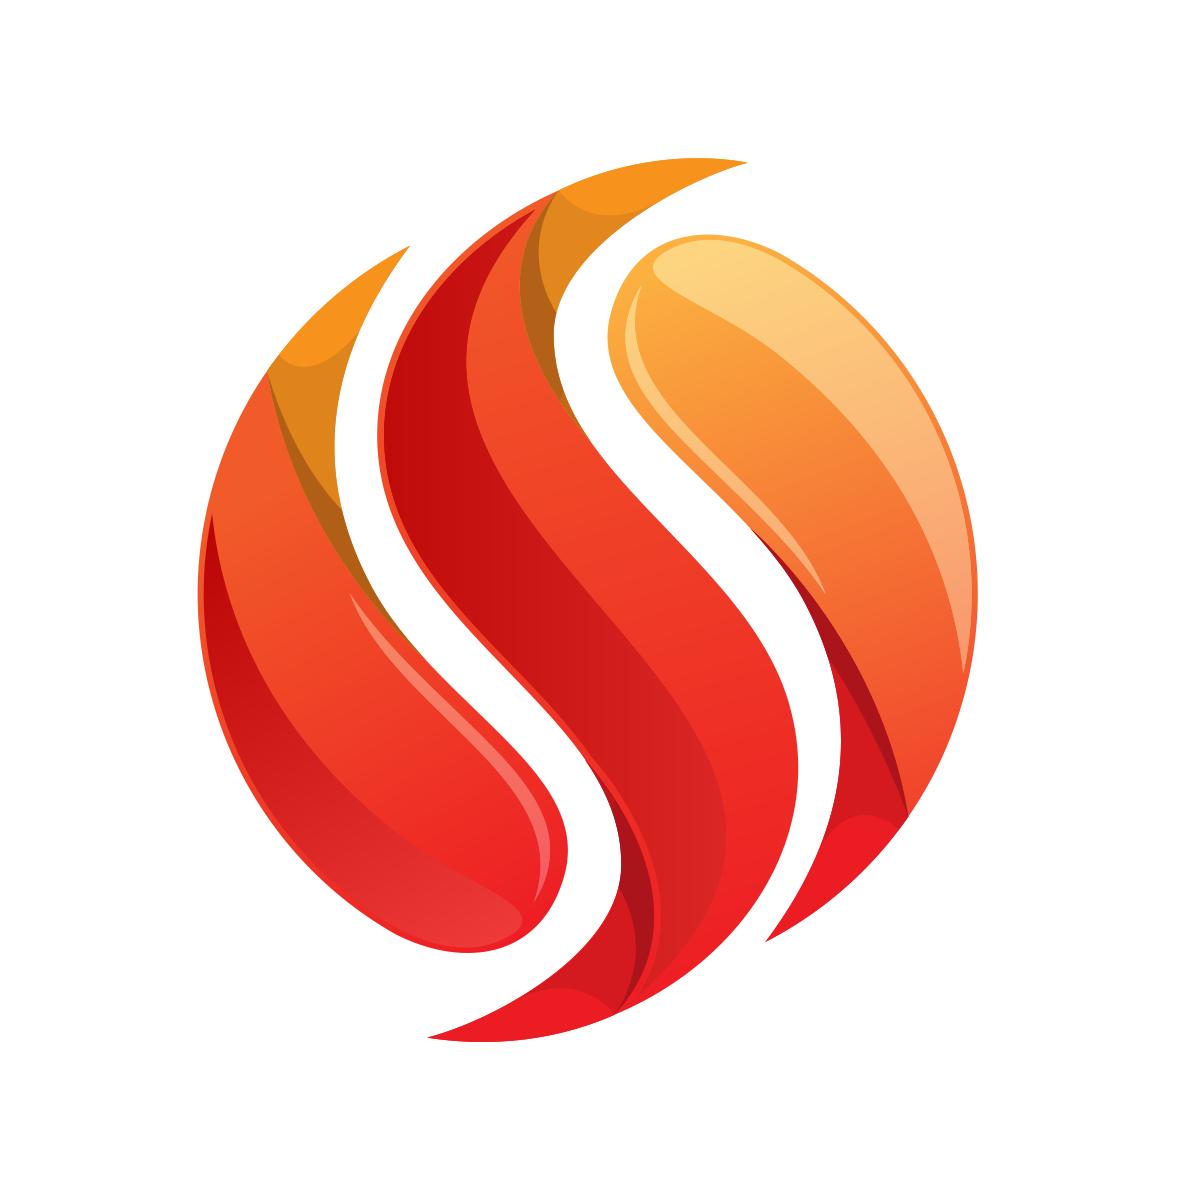 Digital Oil & Gas Solutions